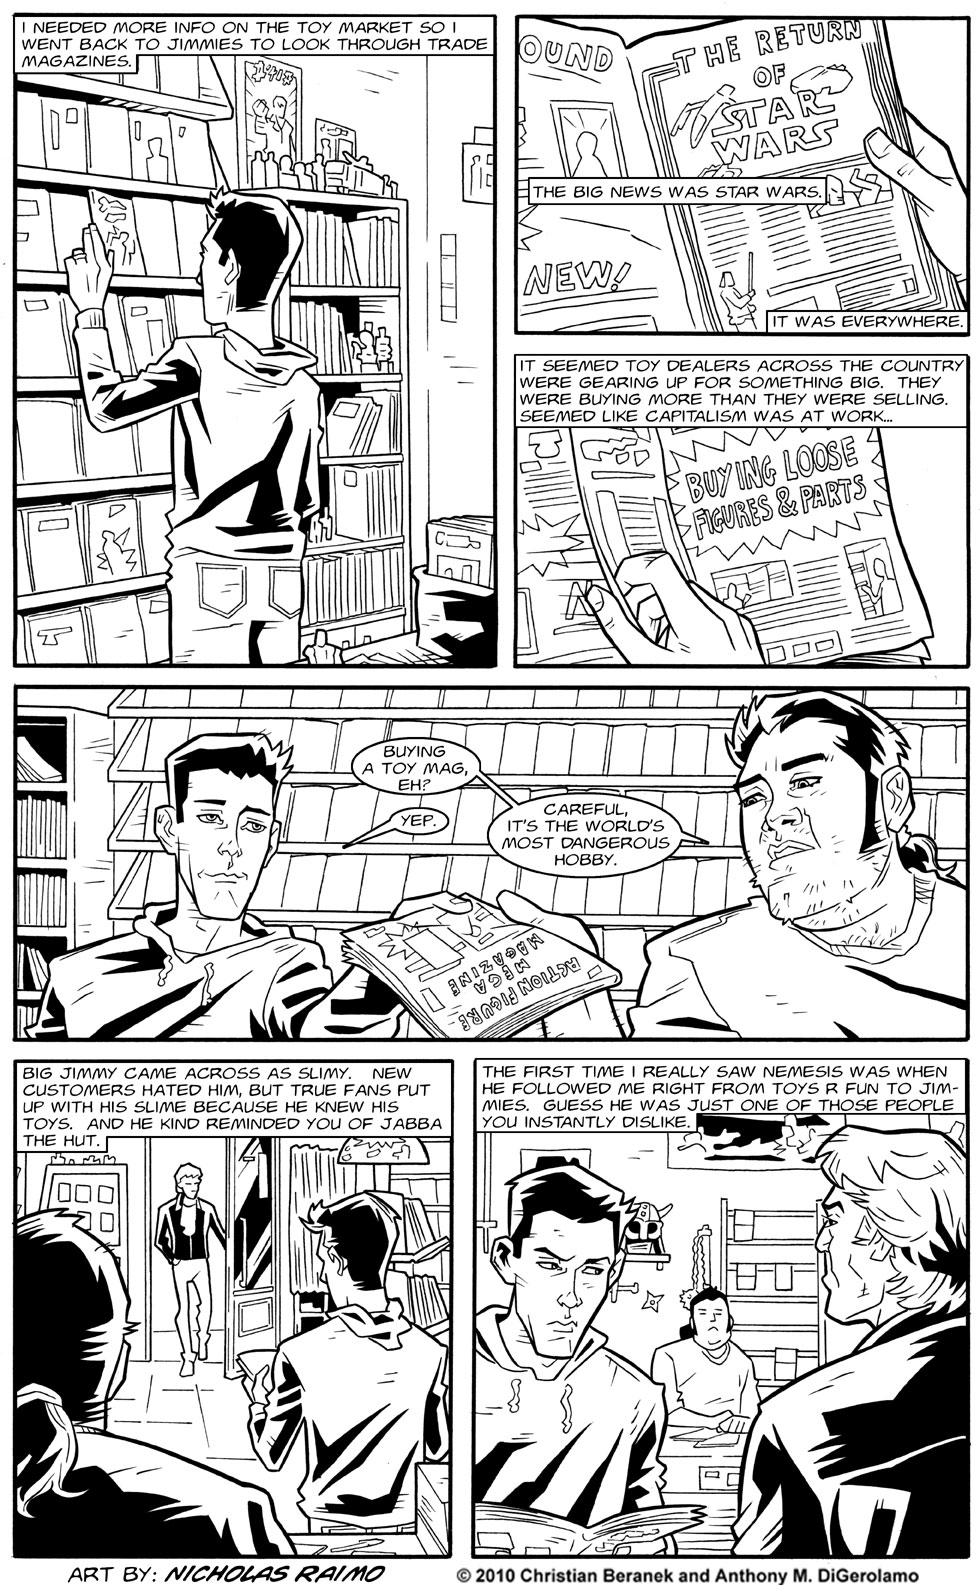 Dealers: Gary Meets the Nemesis